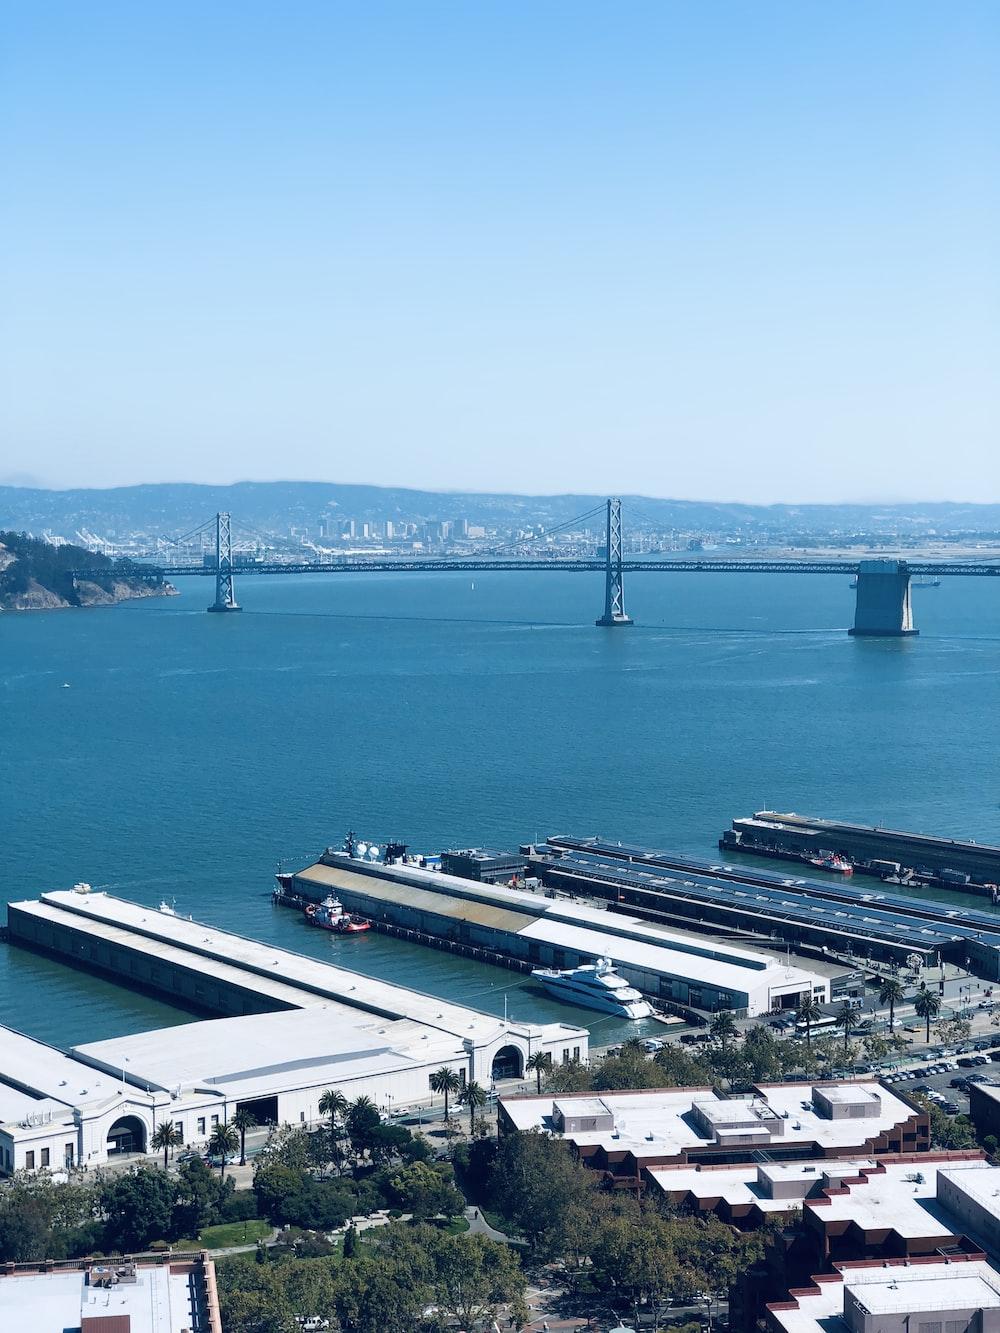 several yacht docked beside dock